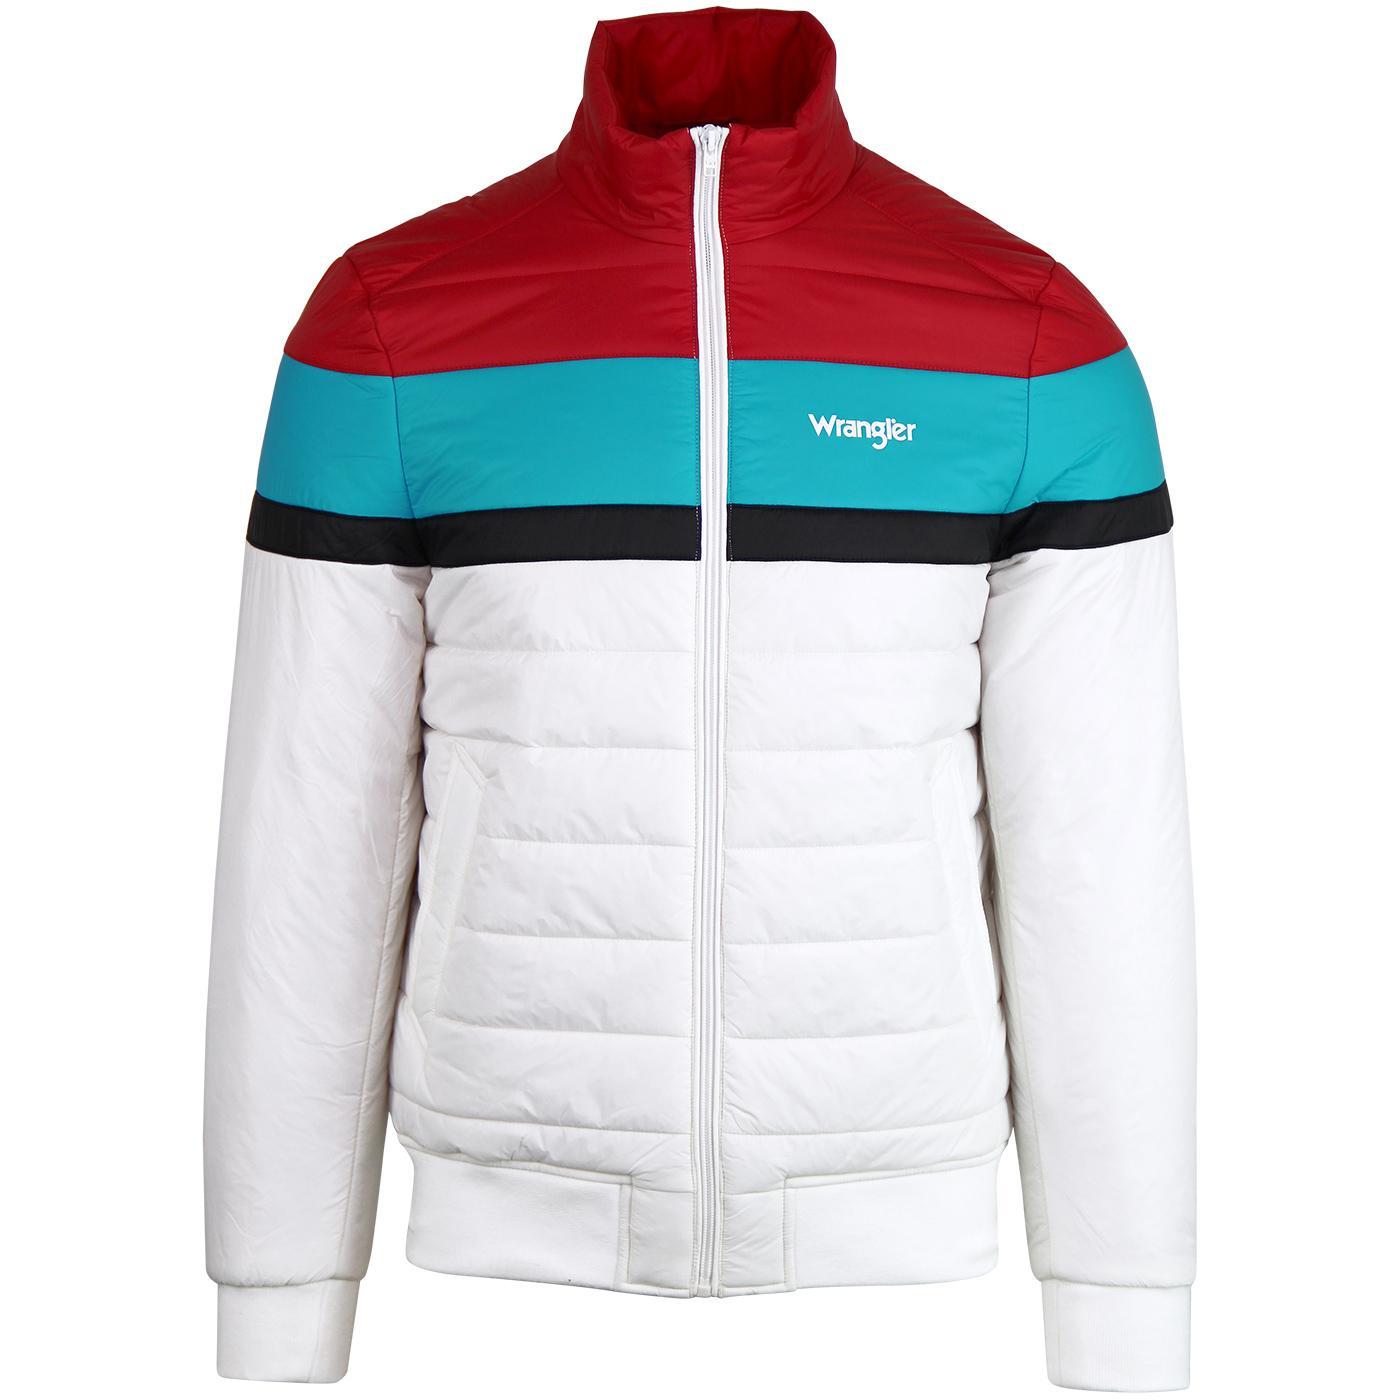 WRANGLER Retro 80s Colour Block Puffer Jacket (OW)